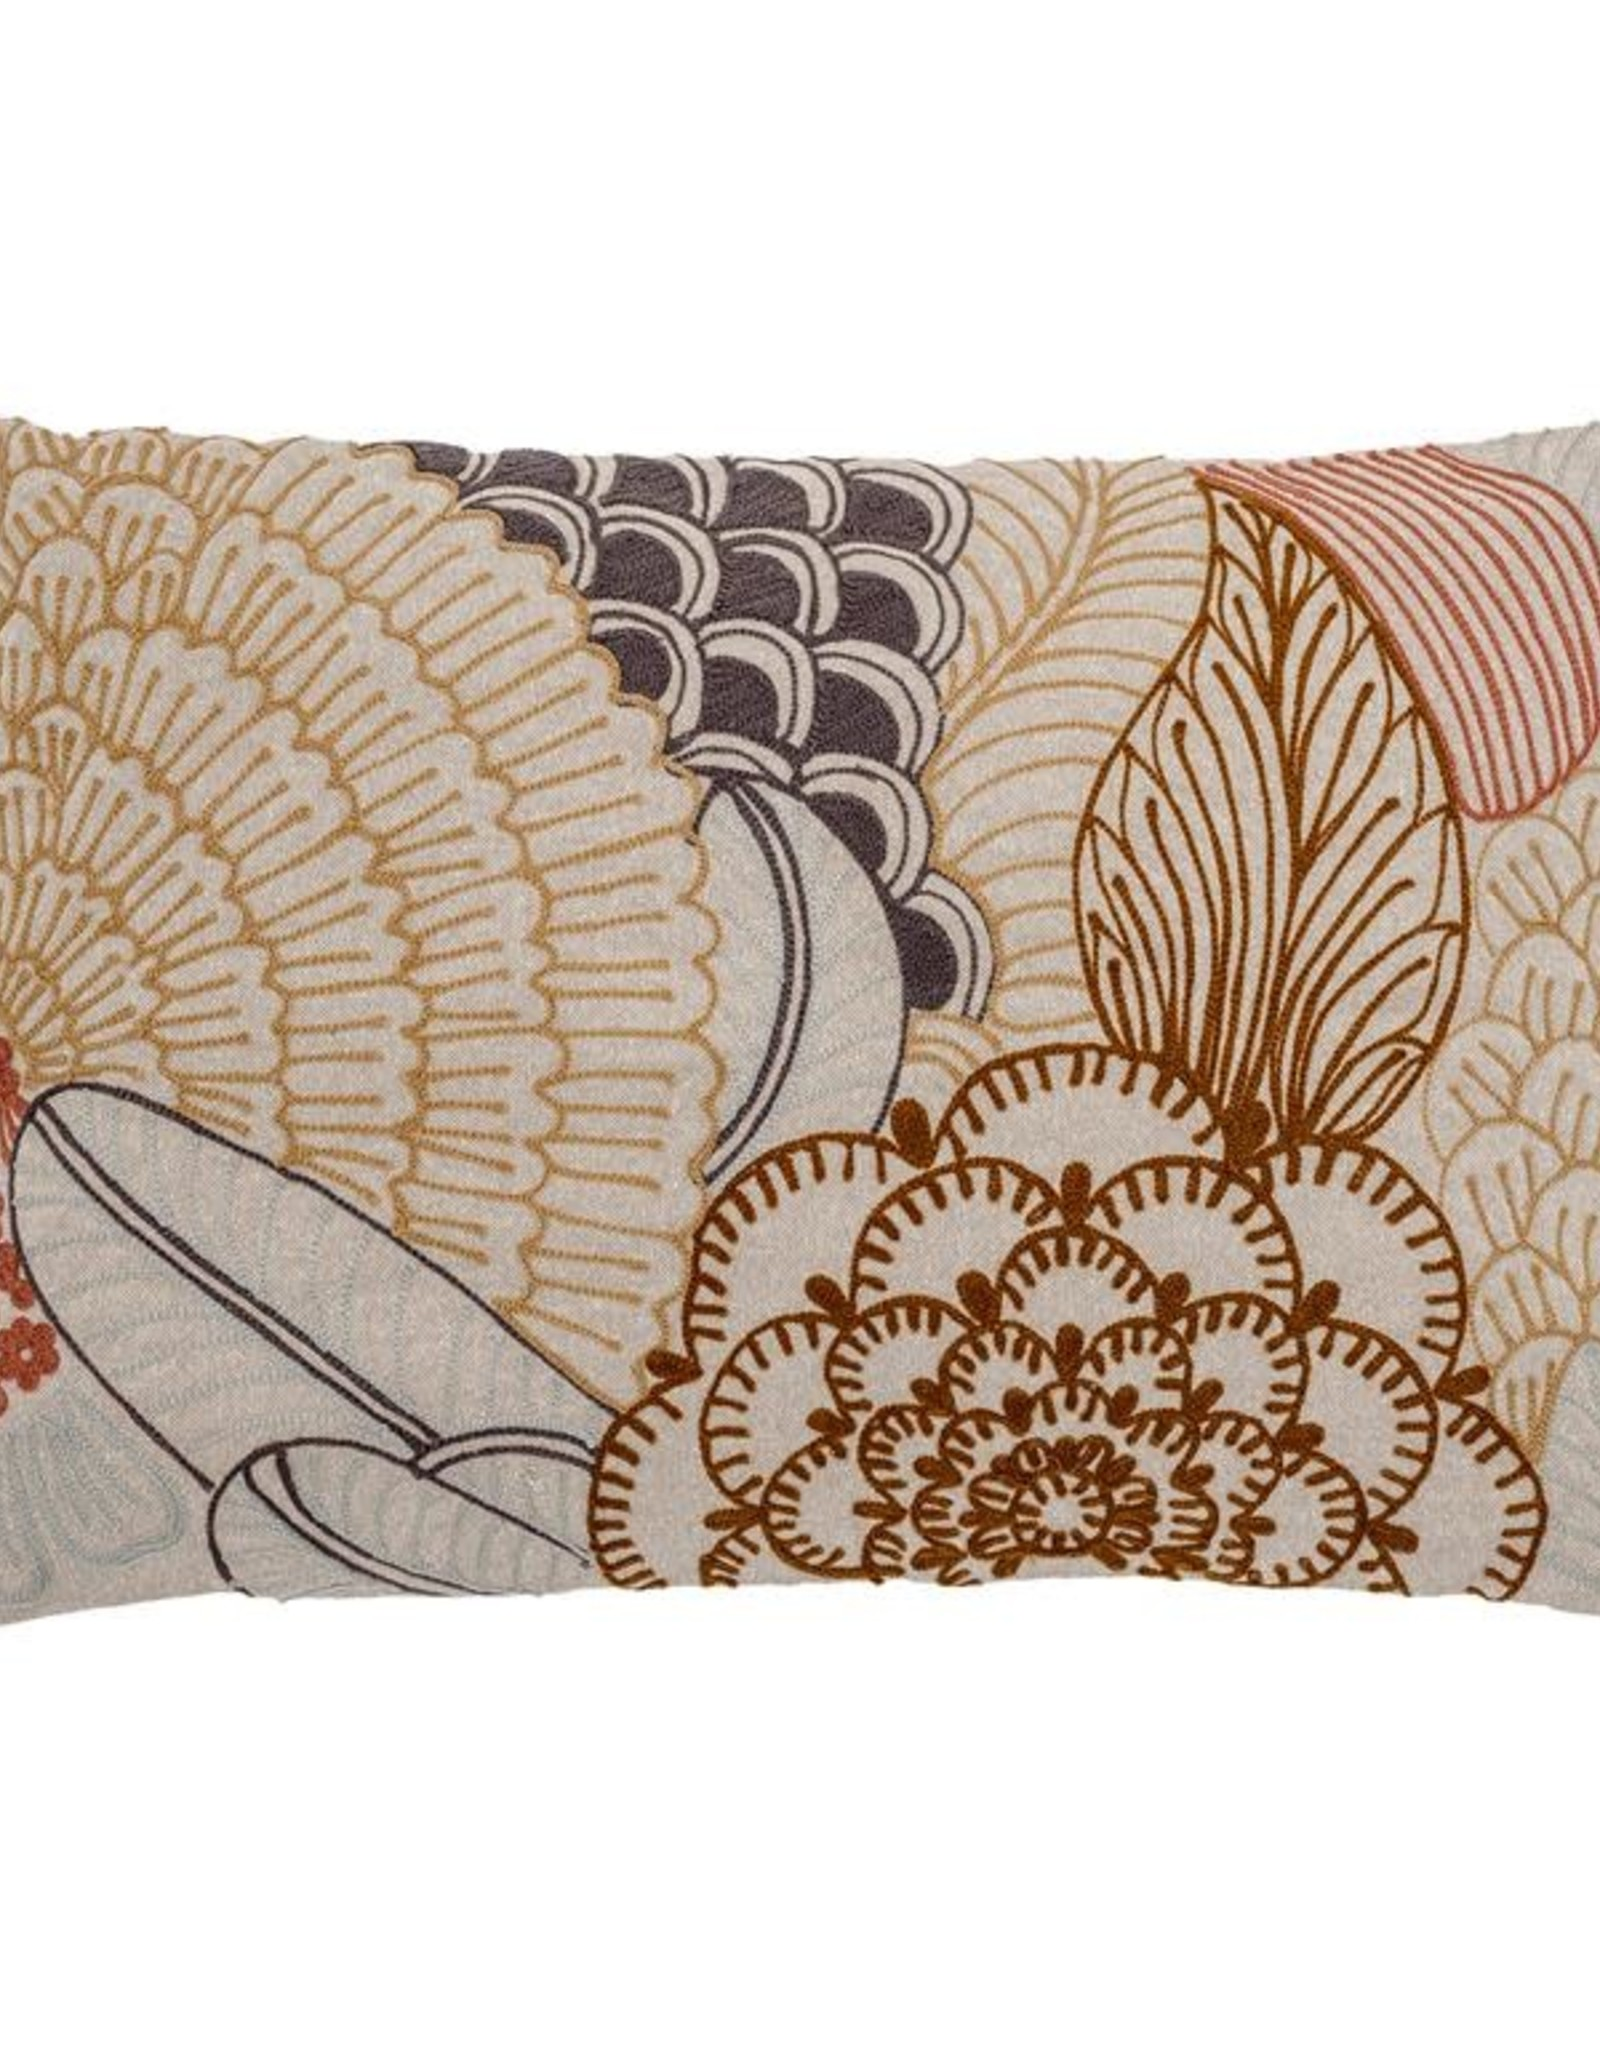 Bloomingville Bloomingville - Graham - Cushion, Nature, Cotton 60x40cm